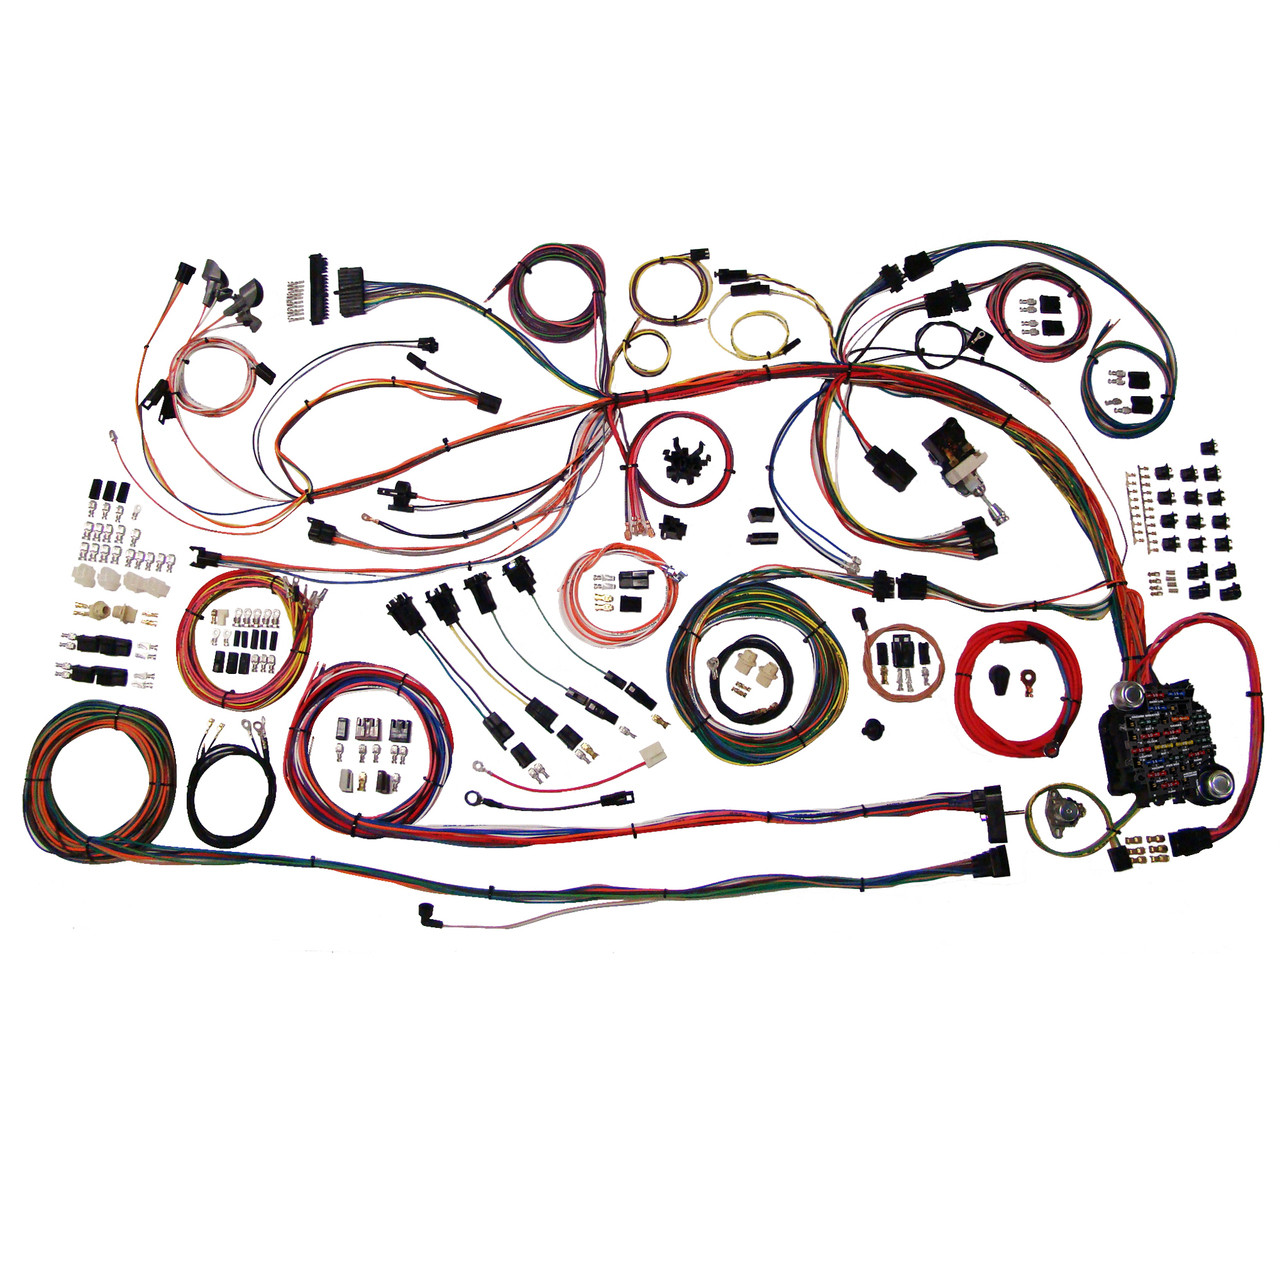 american autowire 1968 1969 chevrolet chevelle el camino classic update complete [ 1280 x 1280 Pixel ]